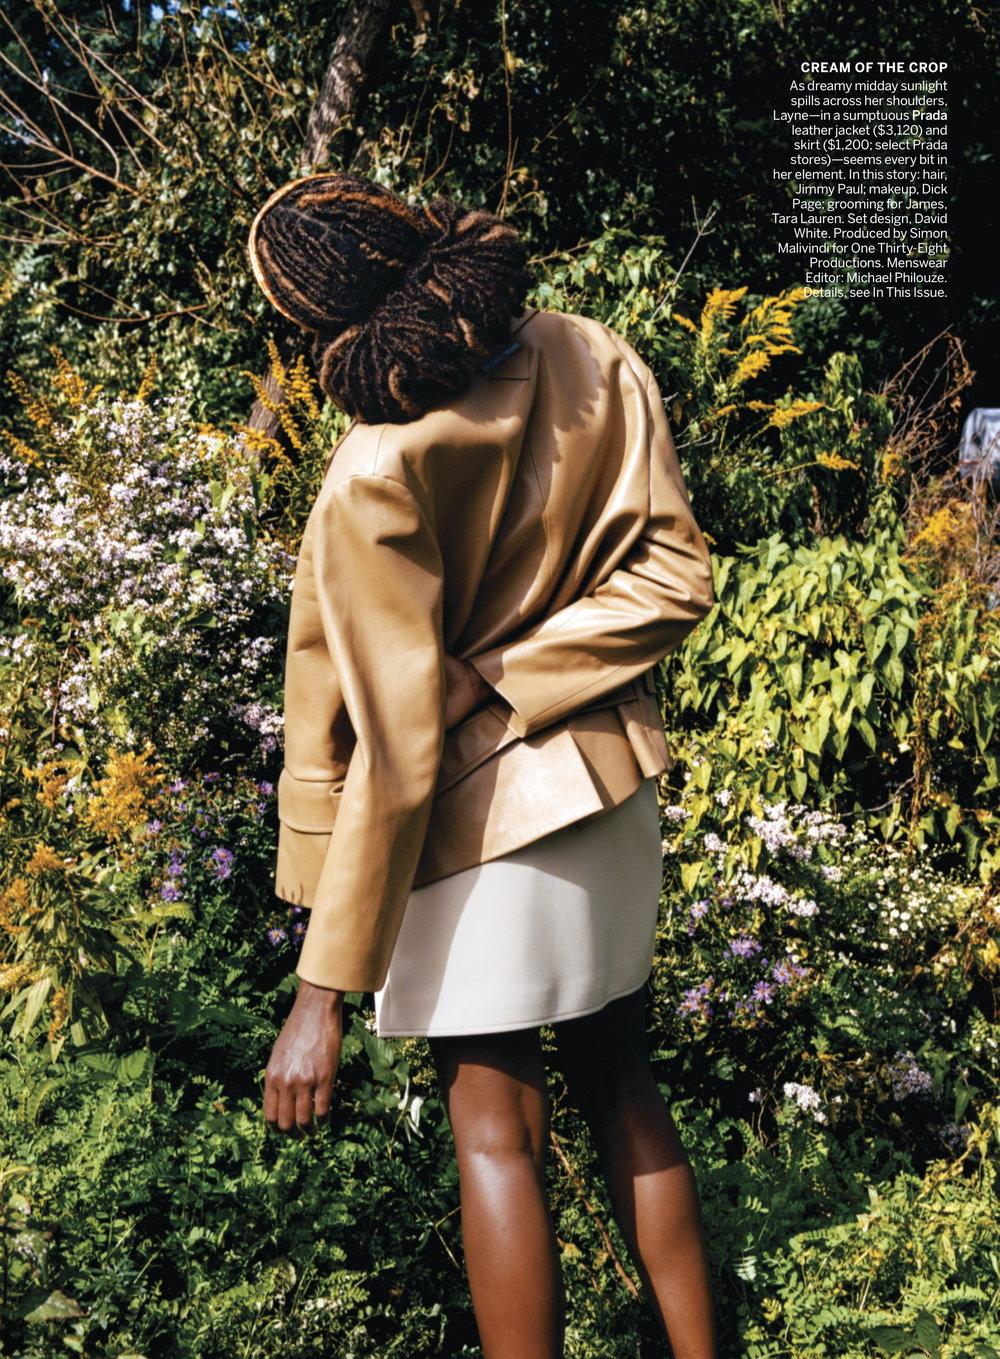 Kiki Layne, Stephan James by Tyler Mitchell for Vogue US Jan 2019 (8).jpg